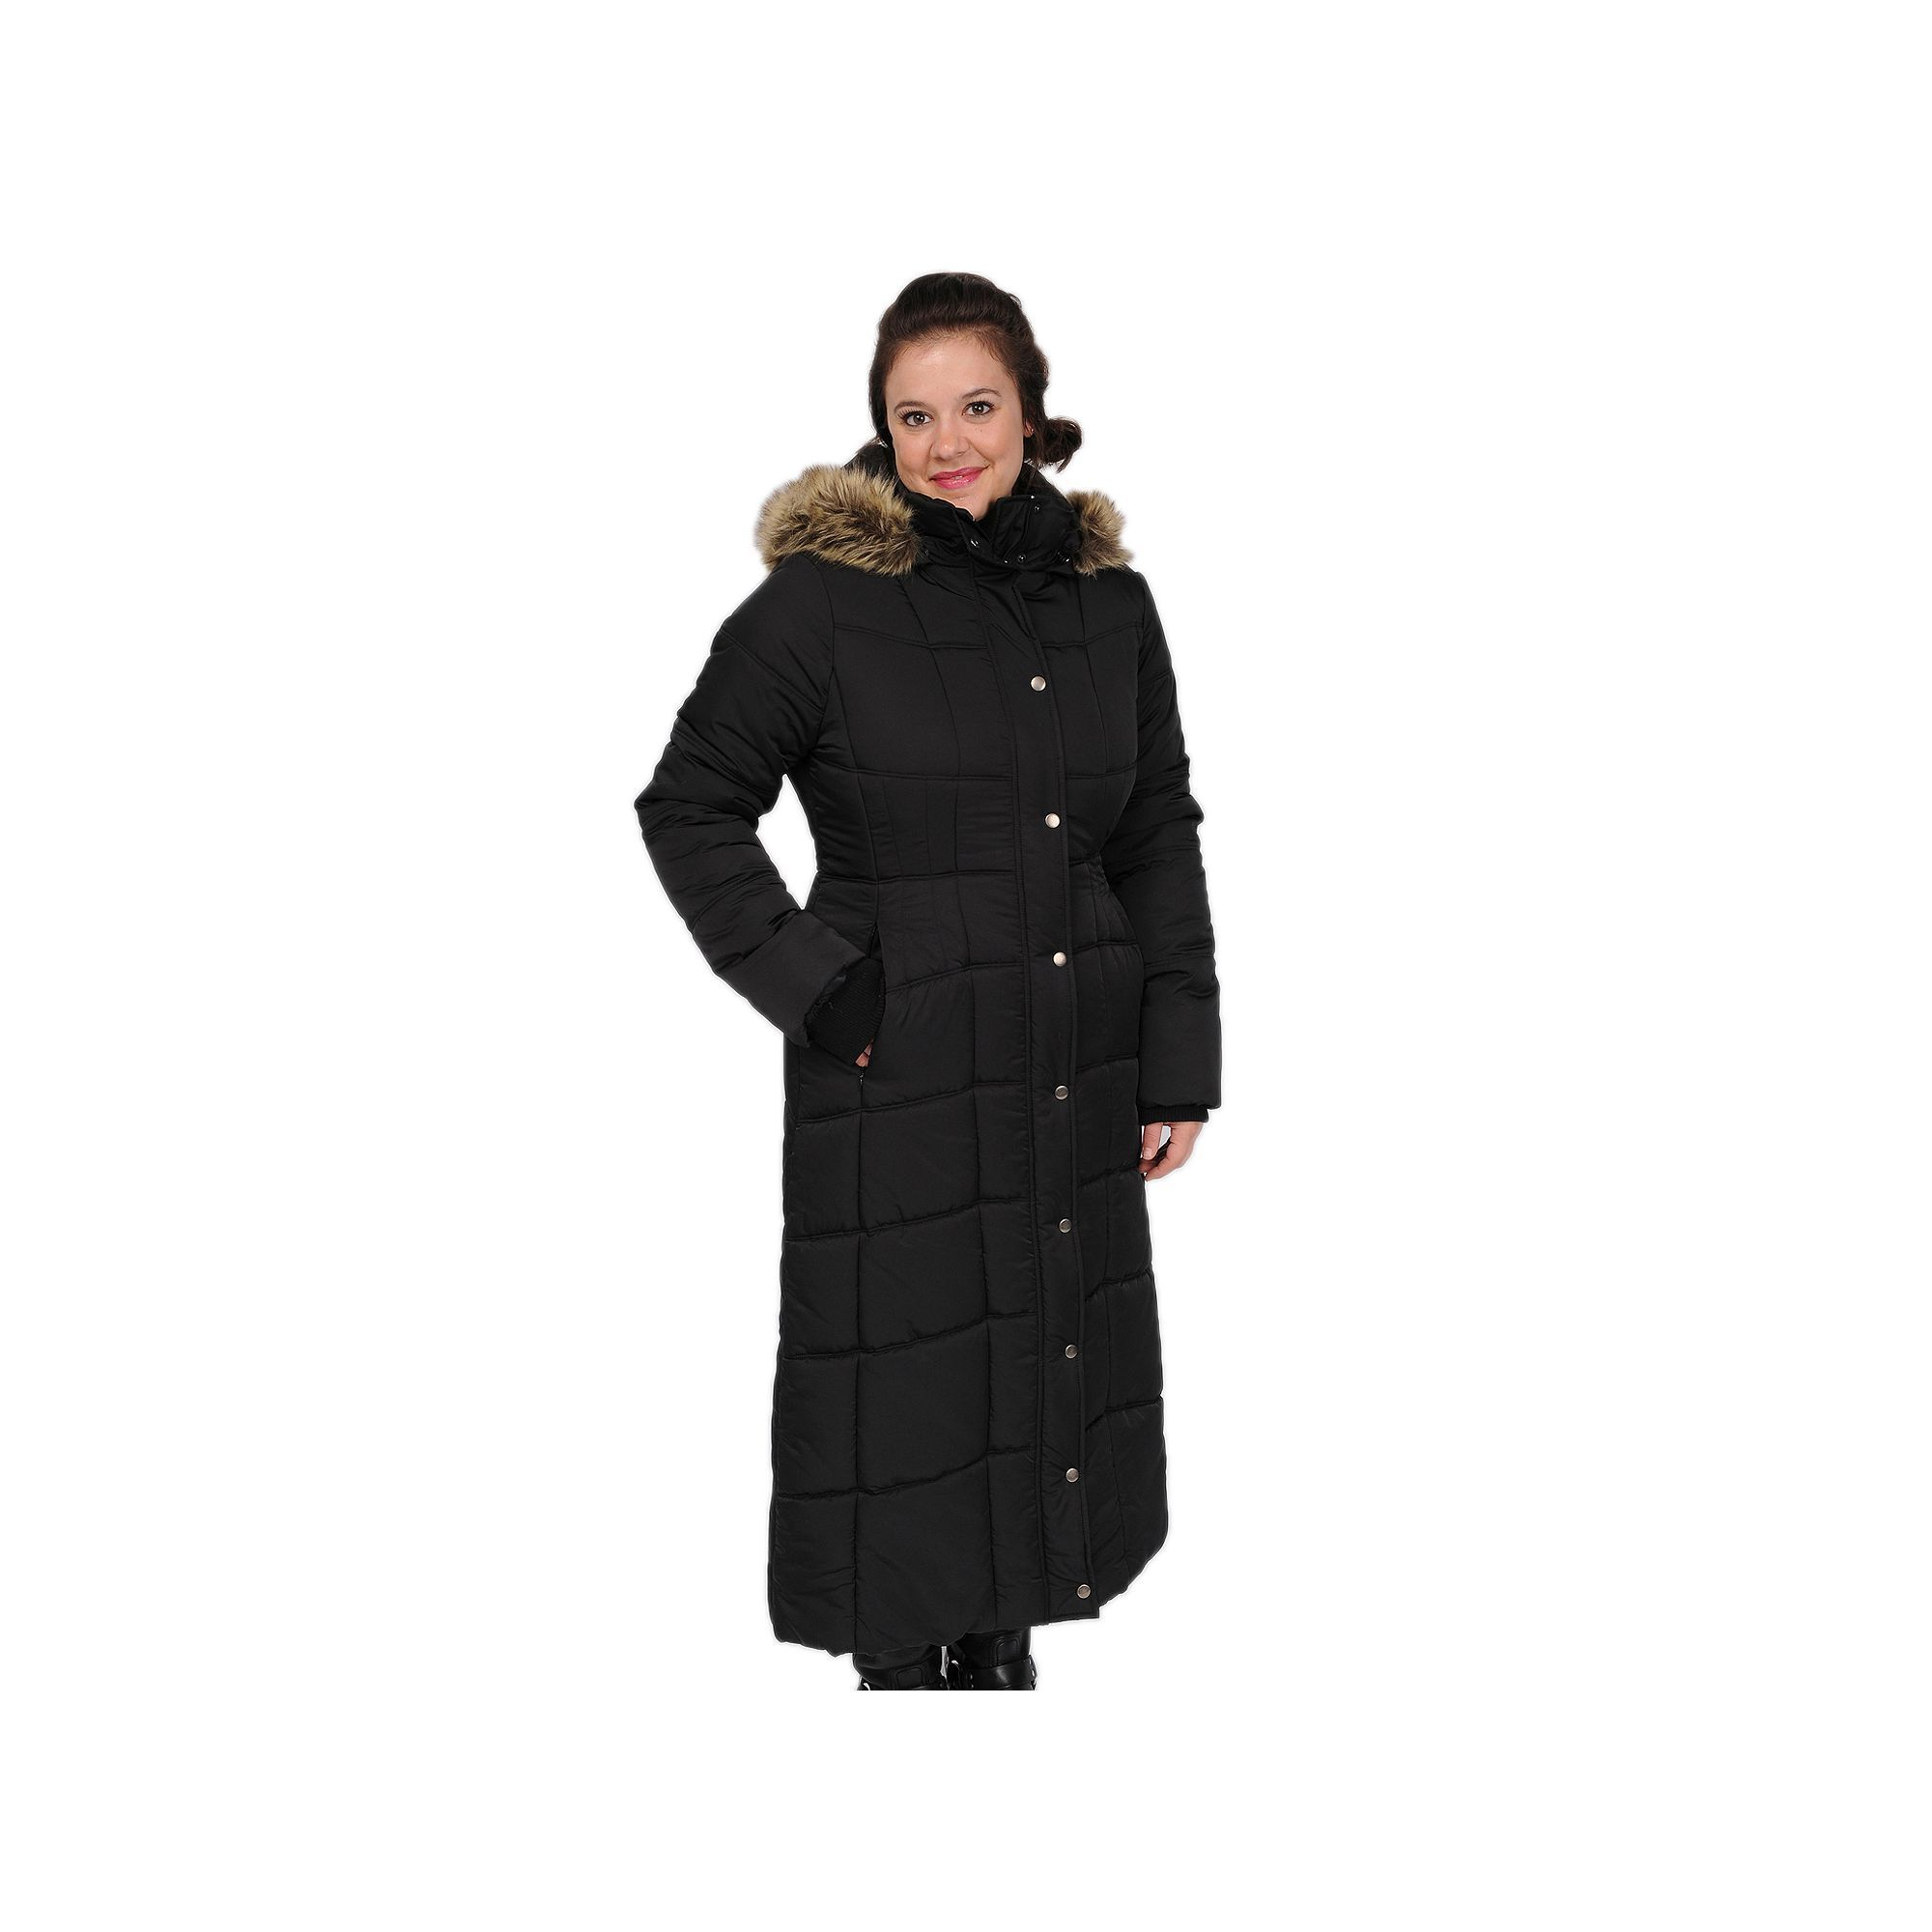 3250405a46b6d Women s Excelled Hooded Long Puffer Coat